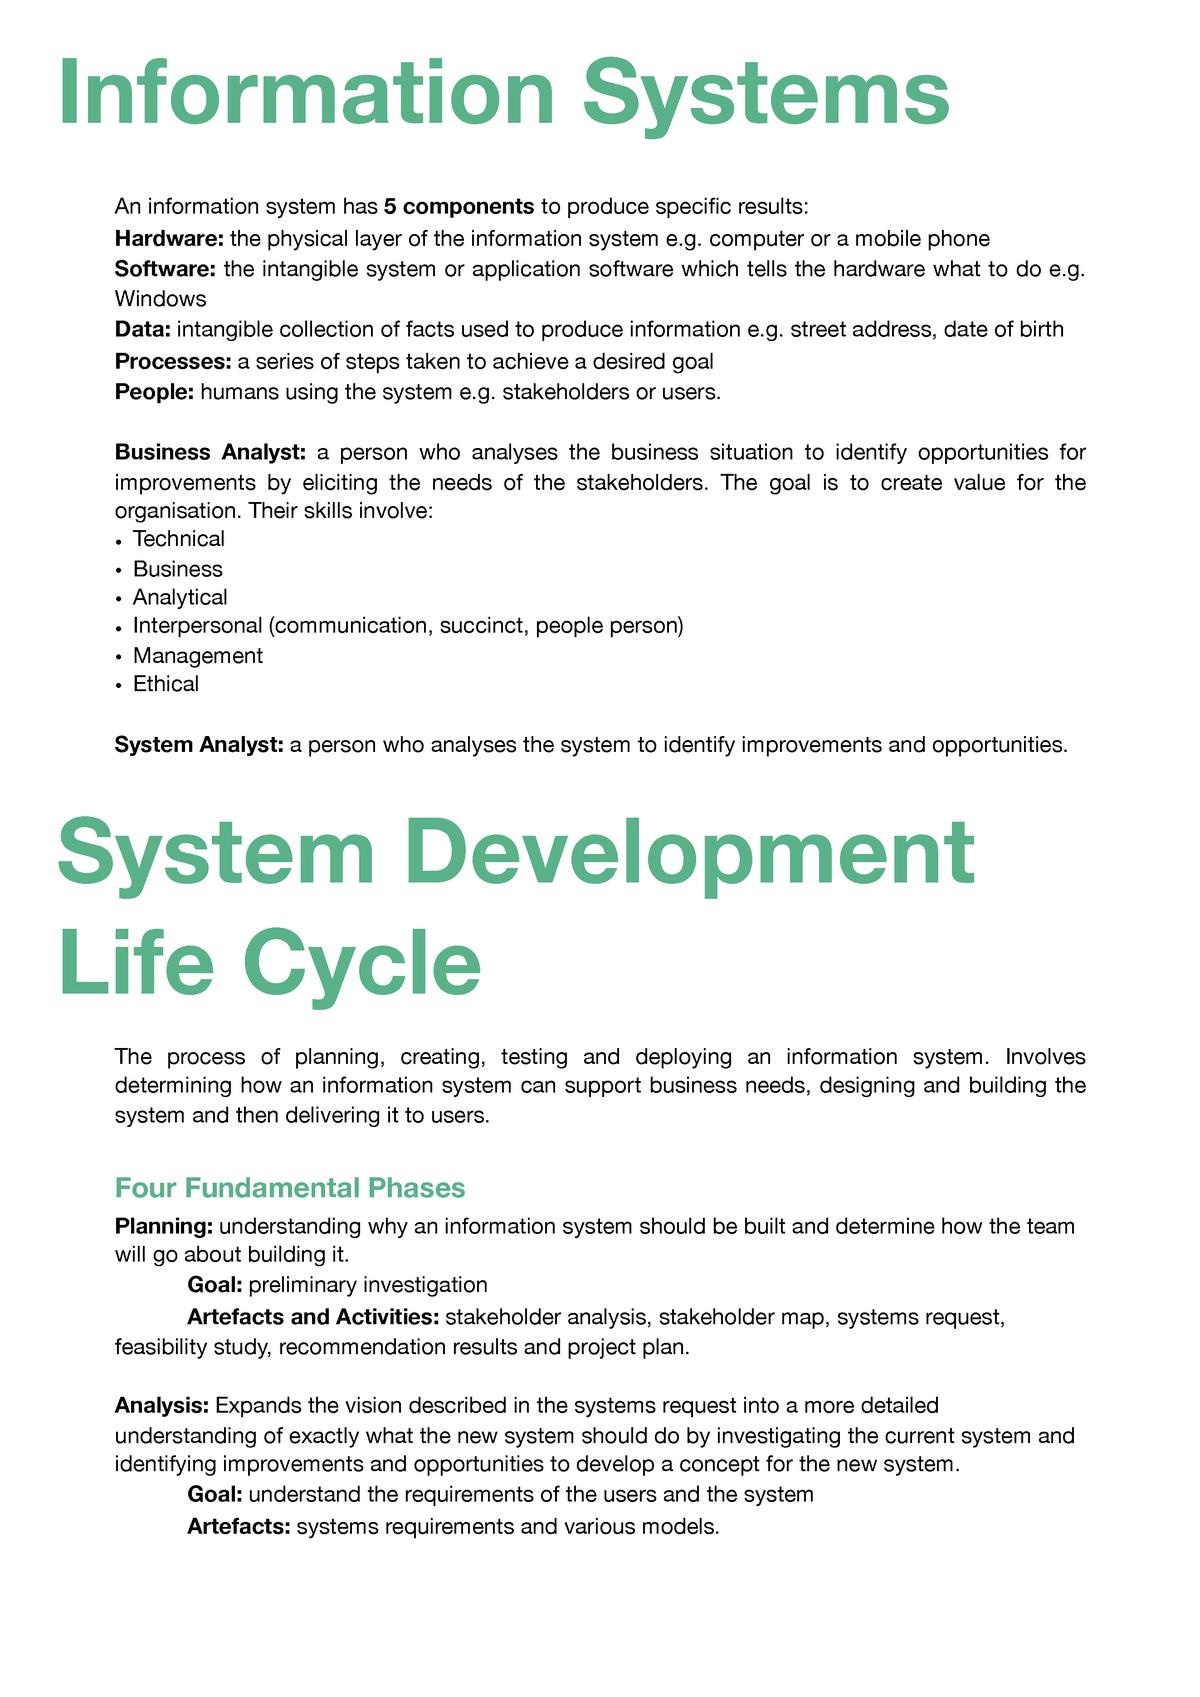 Infosys 220 Test - Business Systems Analysis - StuDocu